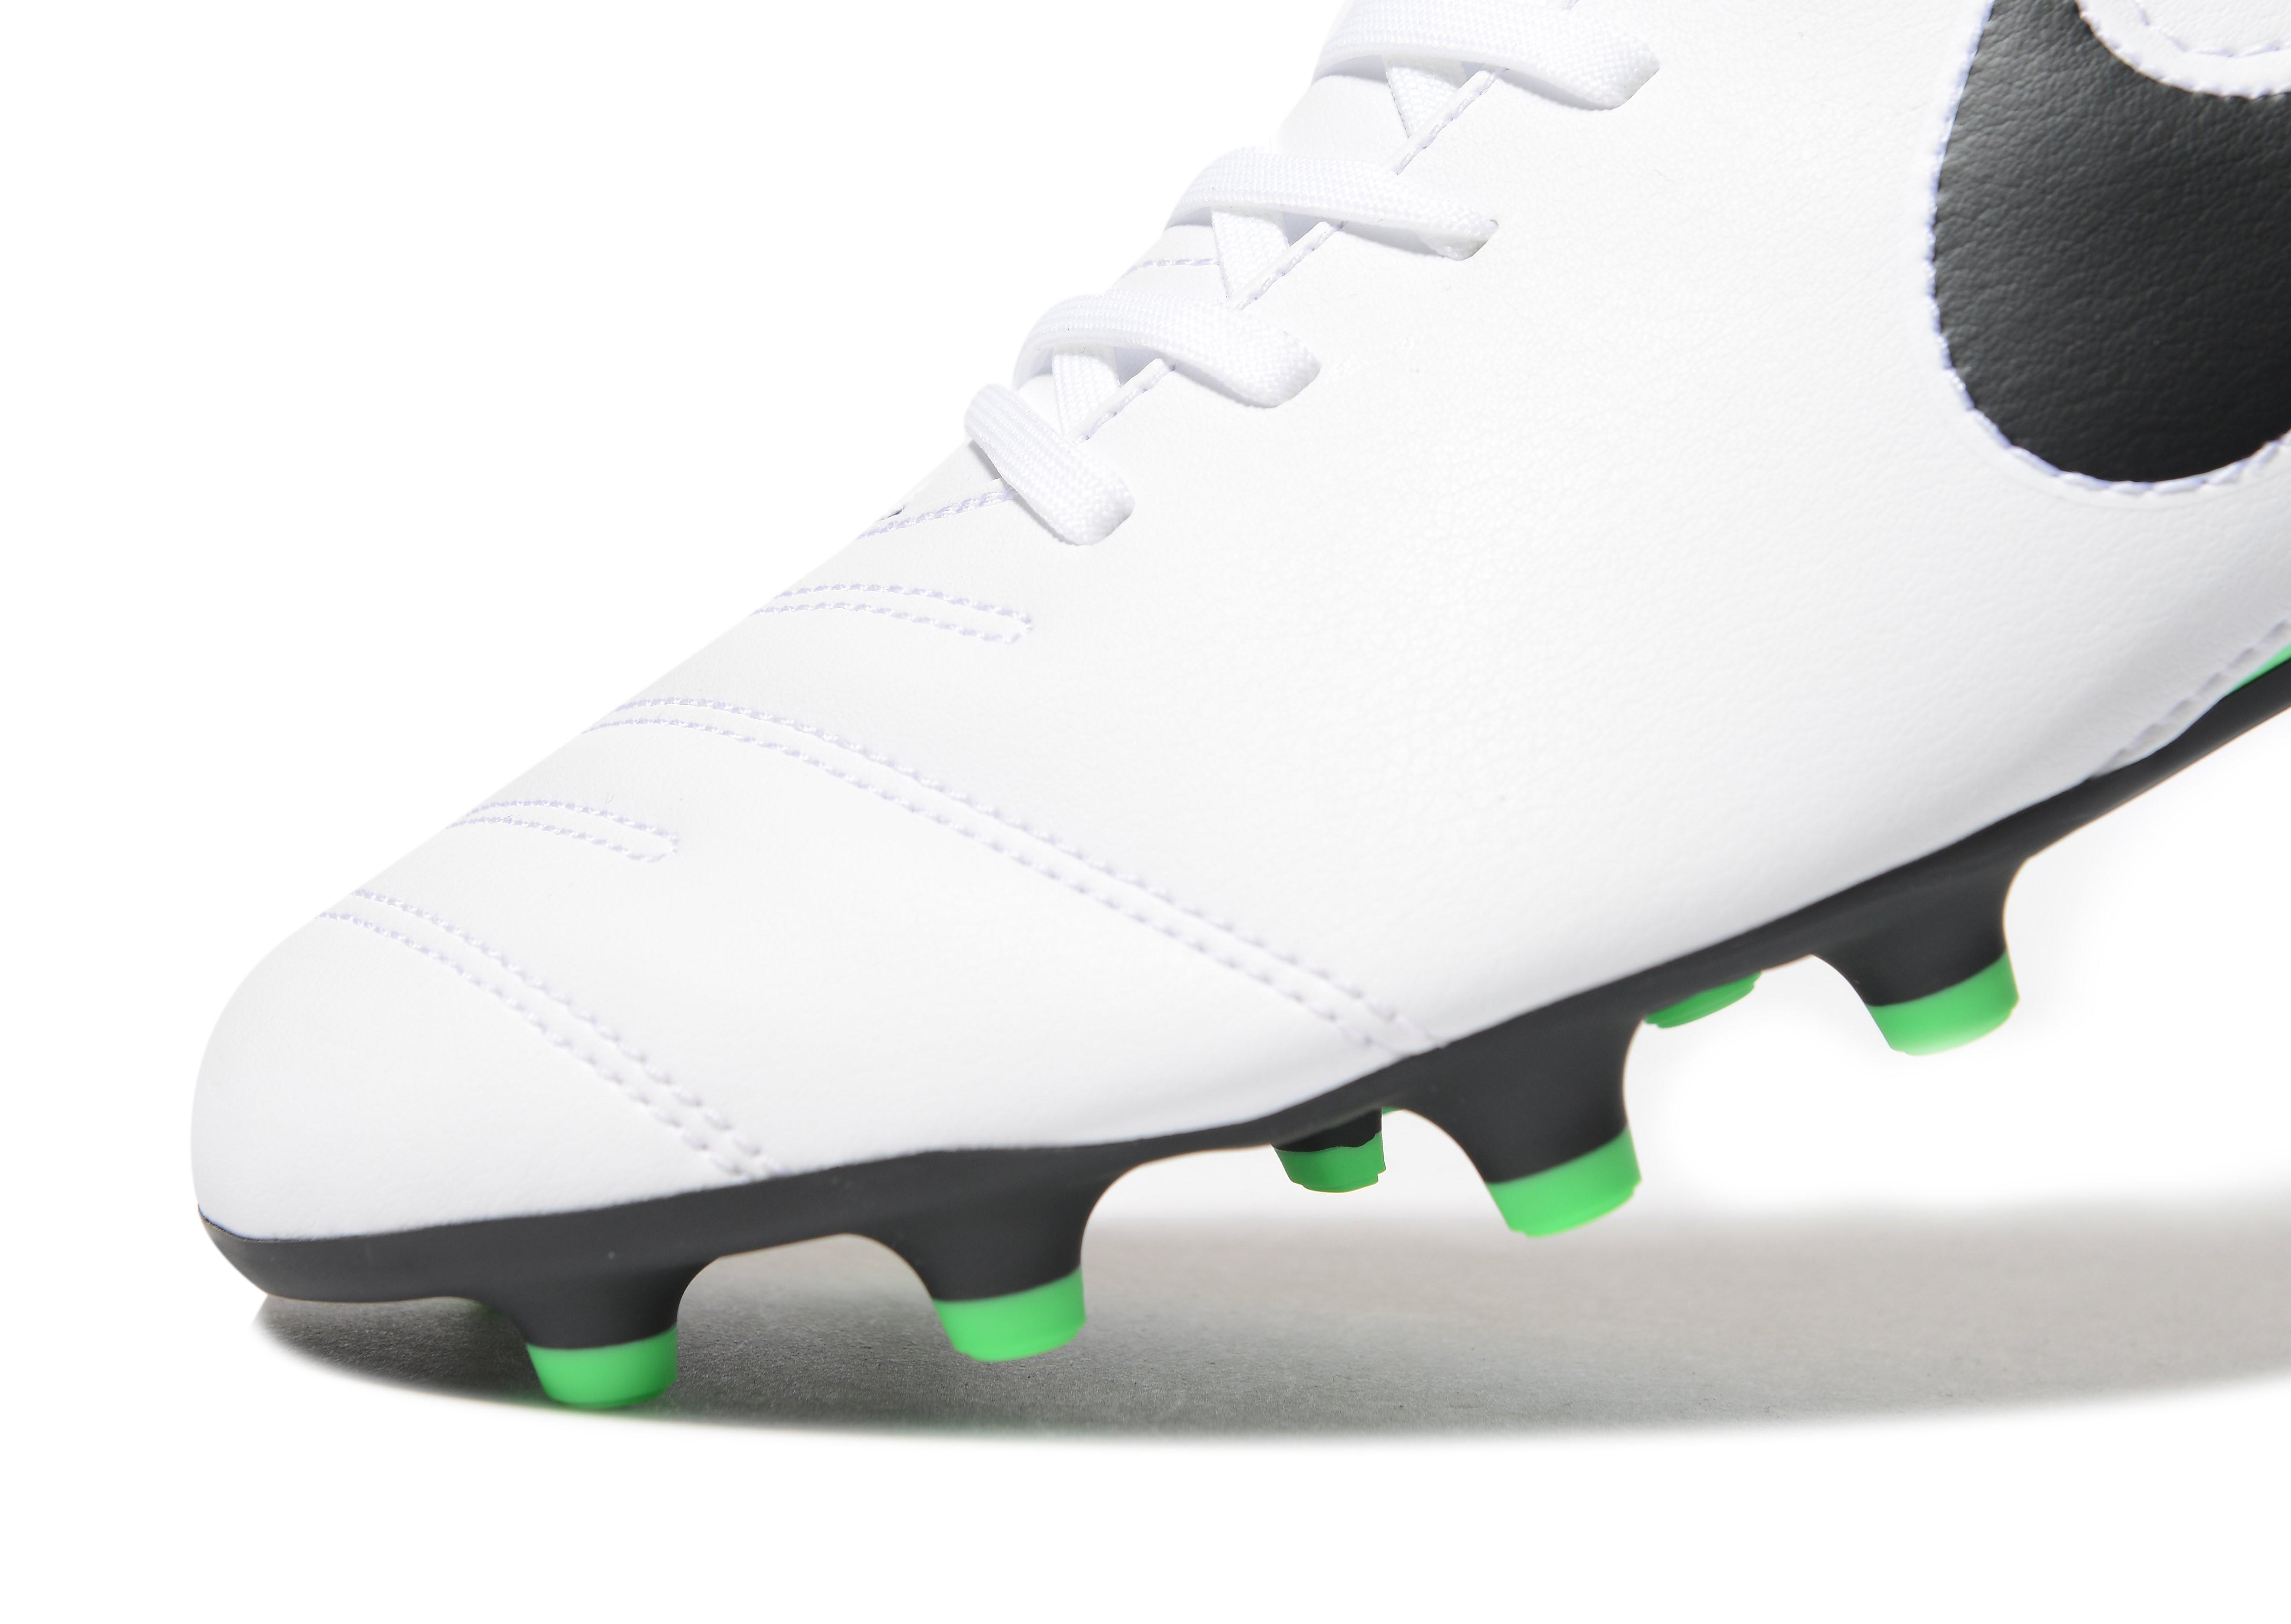 Nike Motion Blur Tiempo Rio Men's FG Football Boots